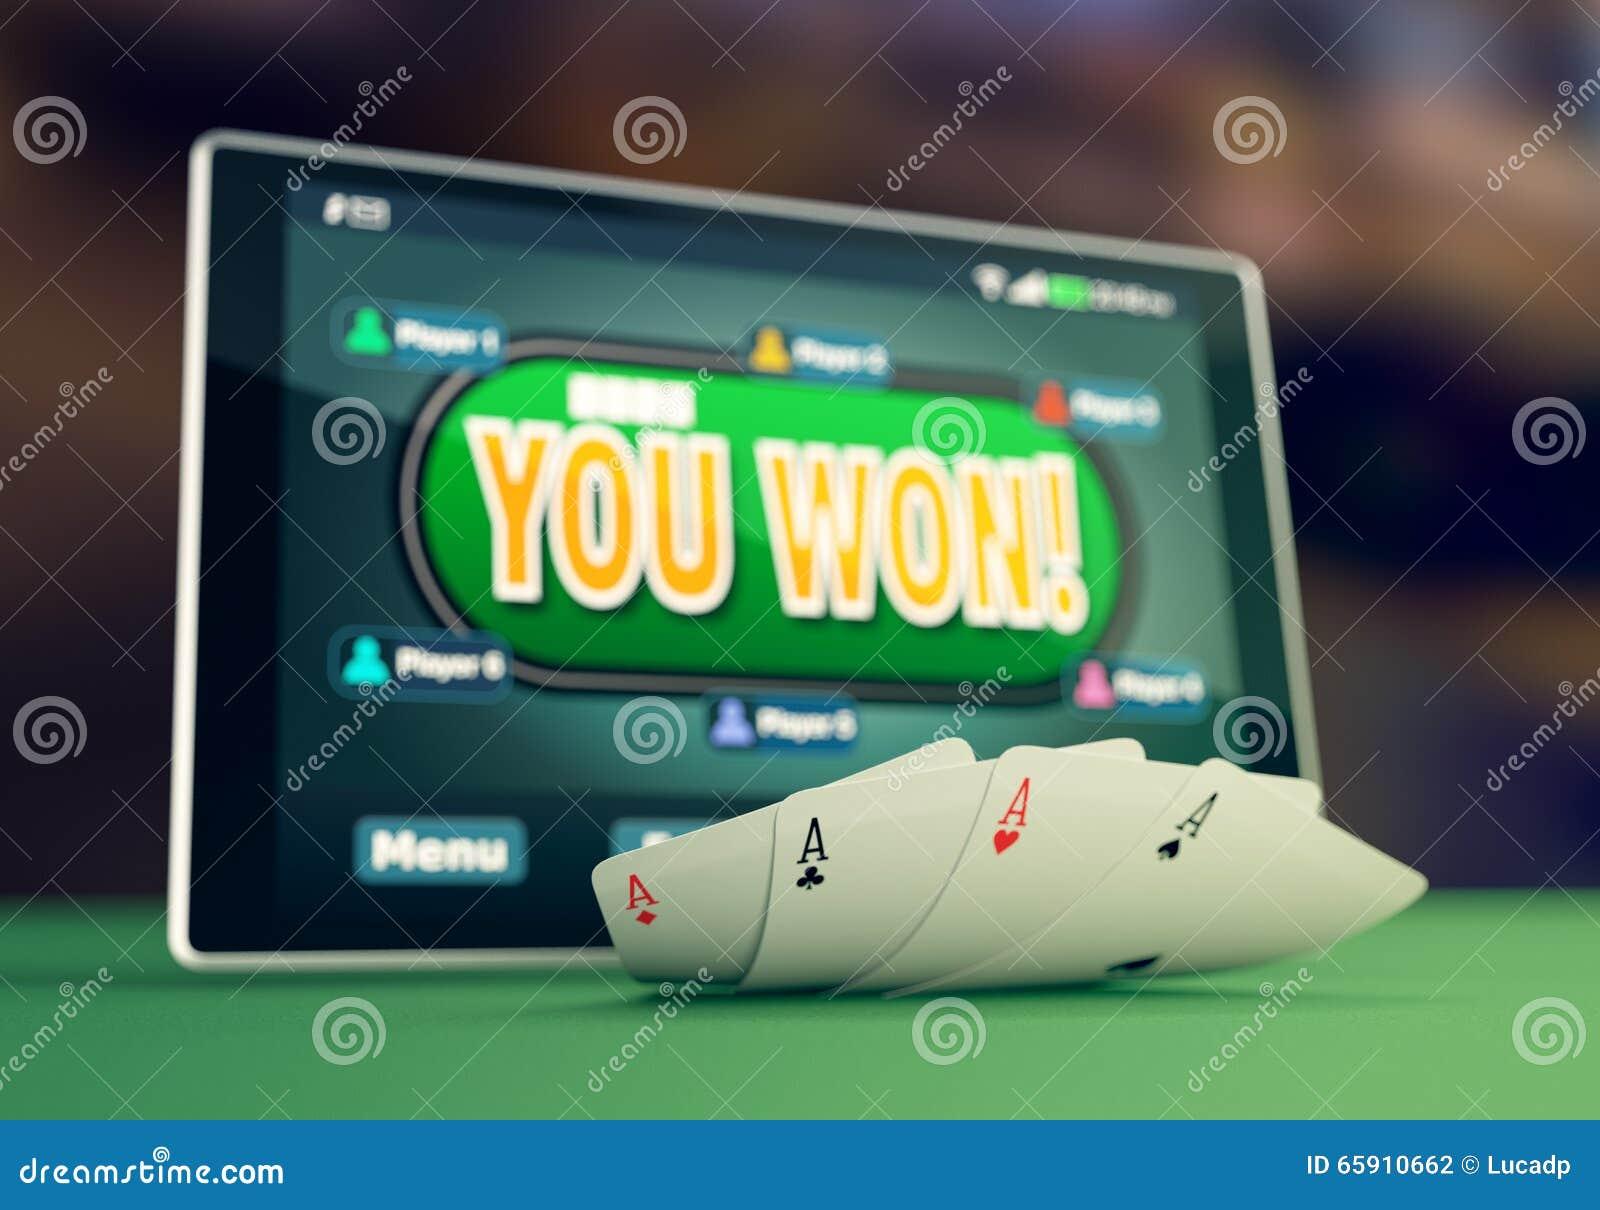 poker-online-closeup-view-tablet-pc-app-winning-situation-four-aces-d-render-65910662.jpg